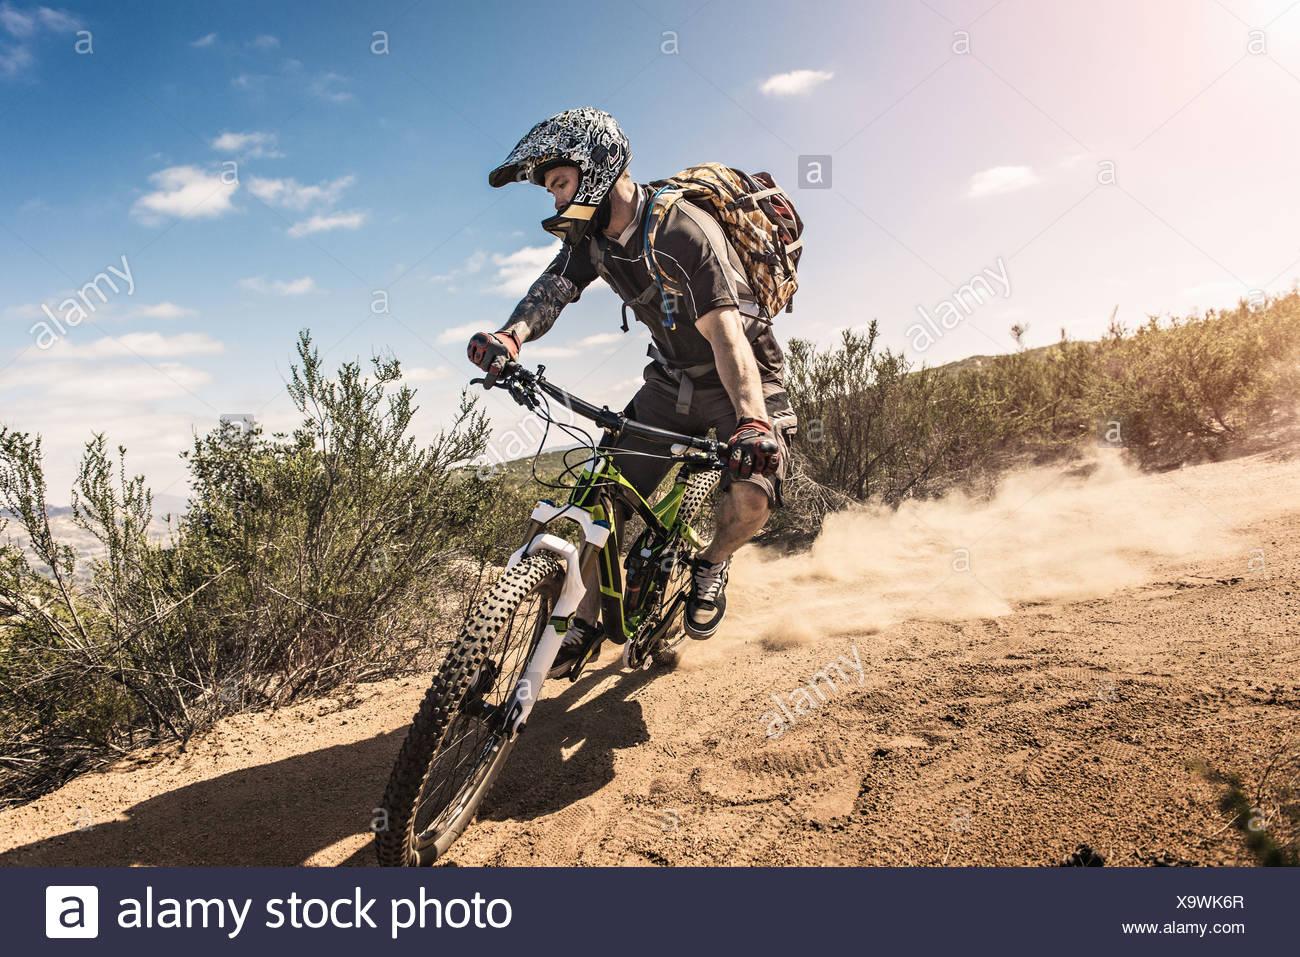 Mountain biker riding downhill - Stock Image